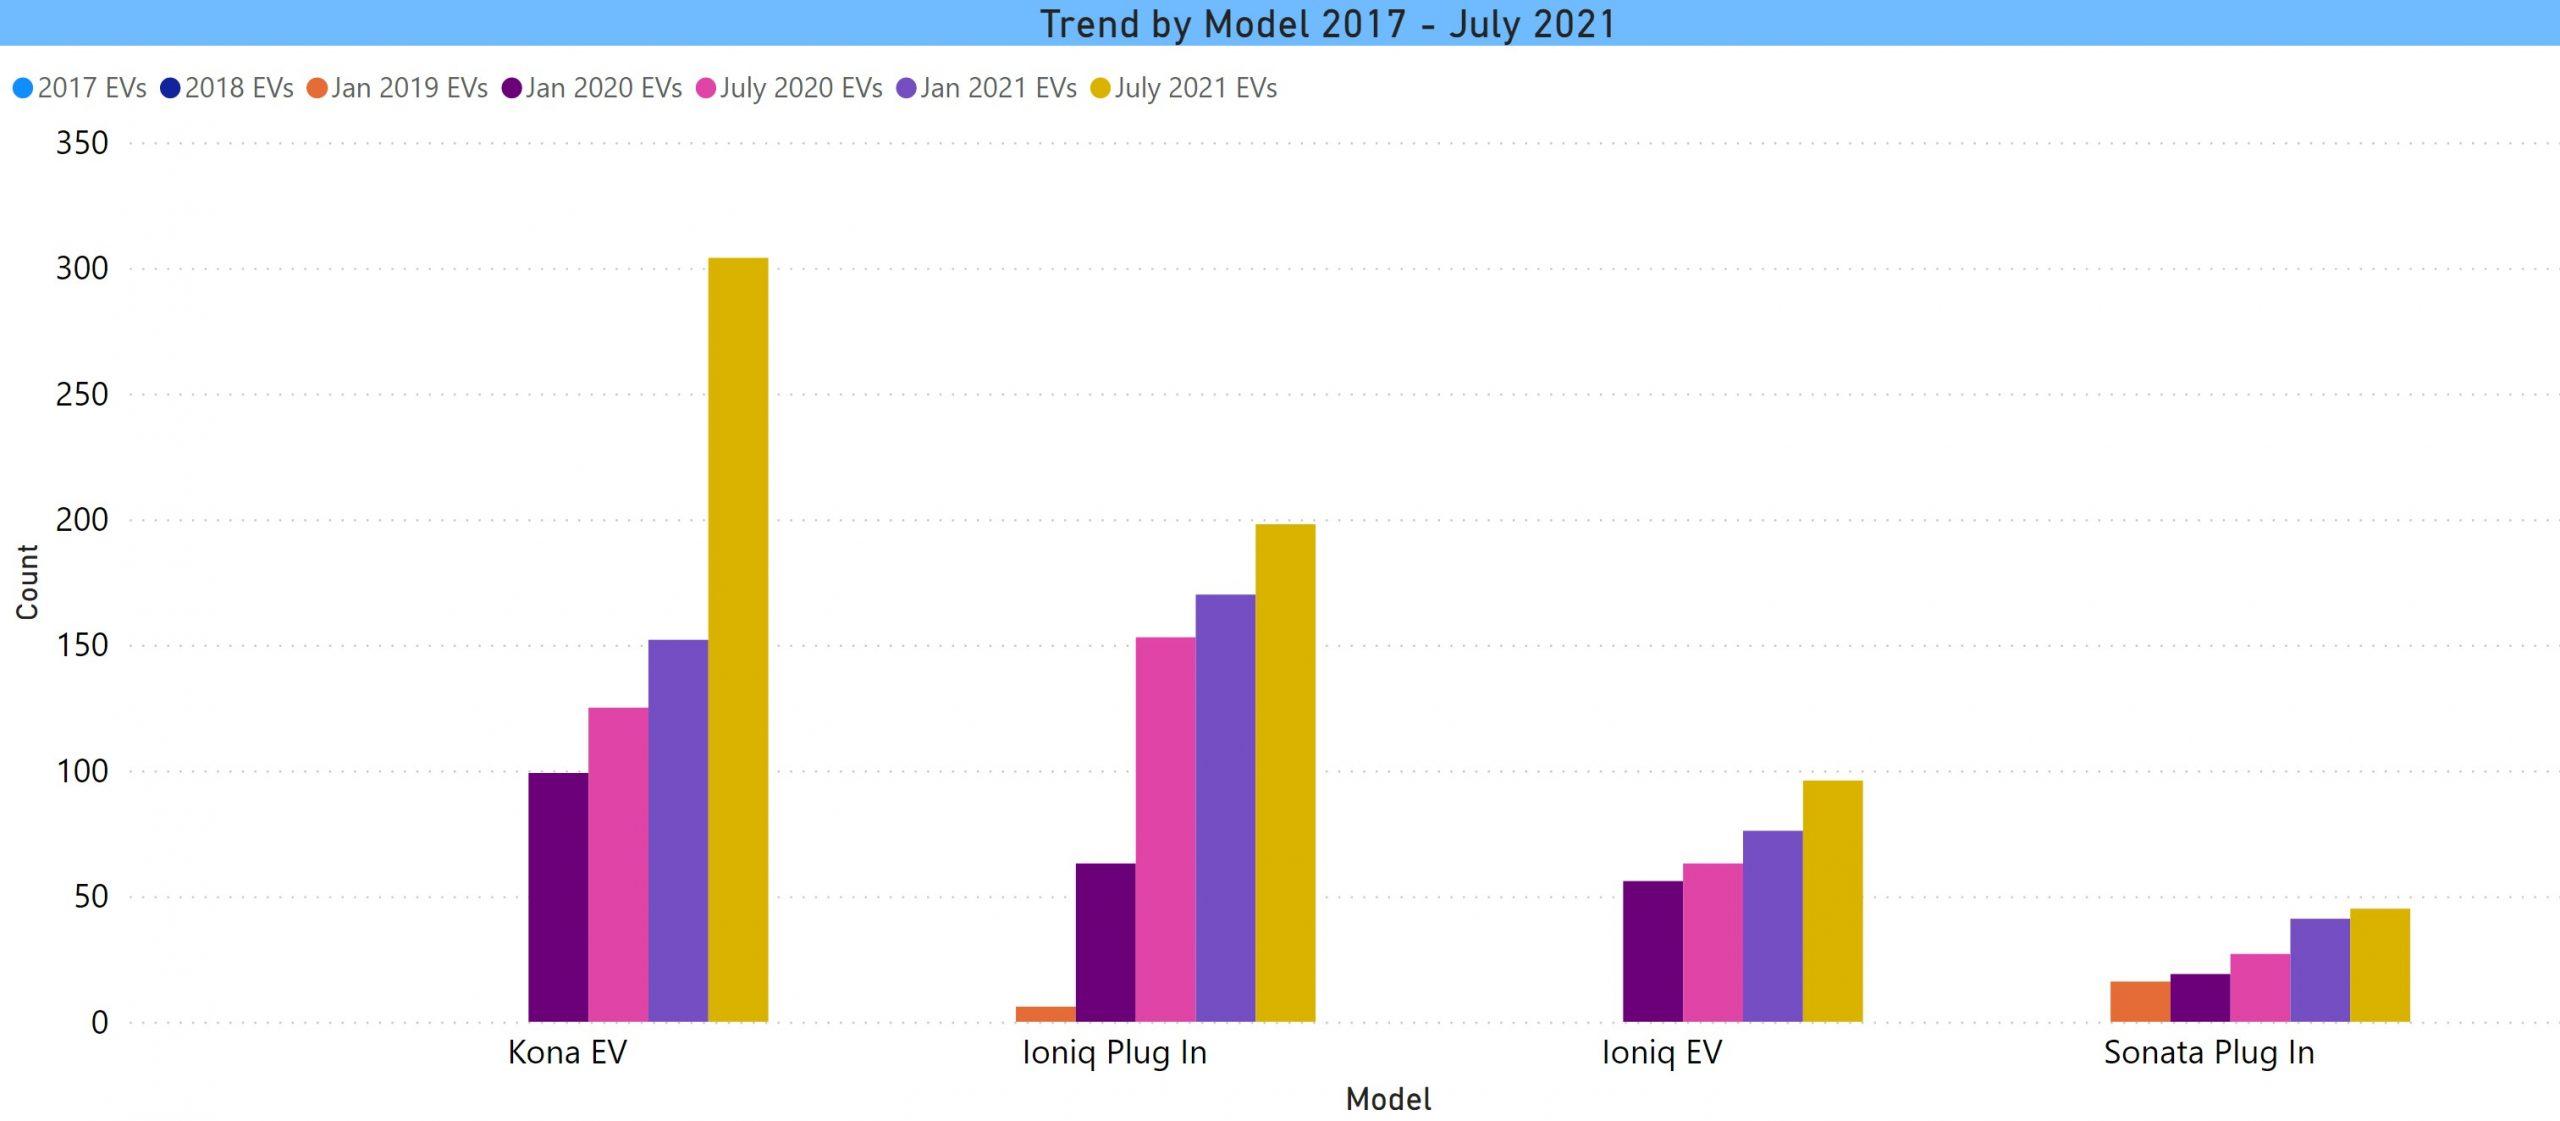 Hyundai model trend